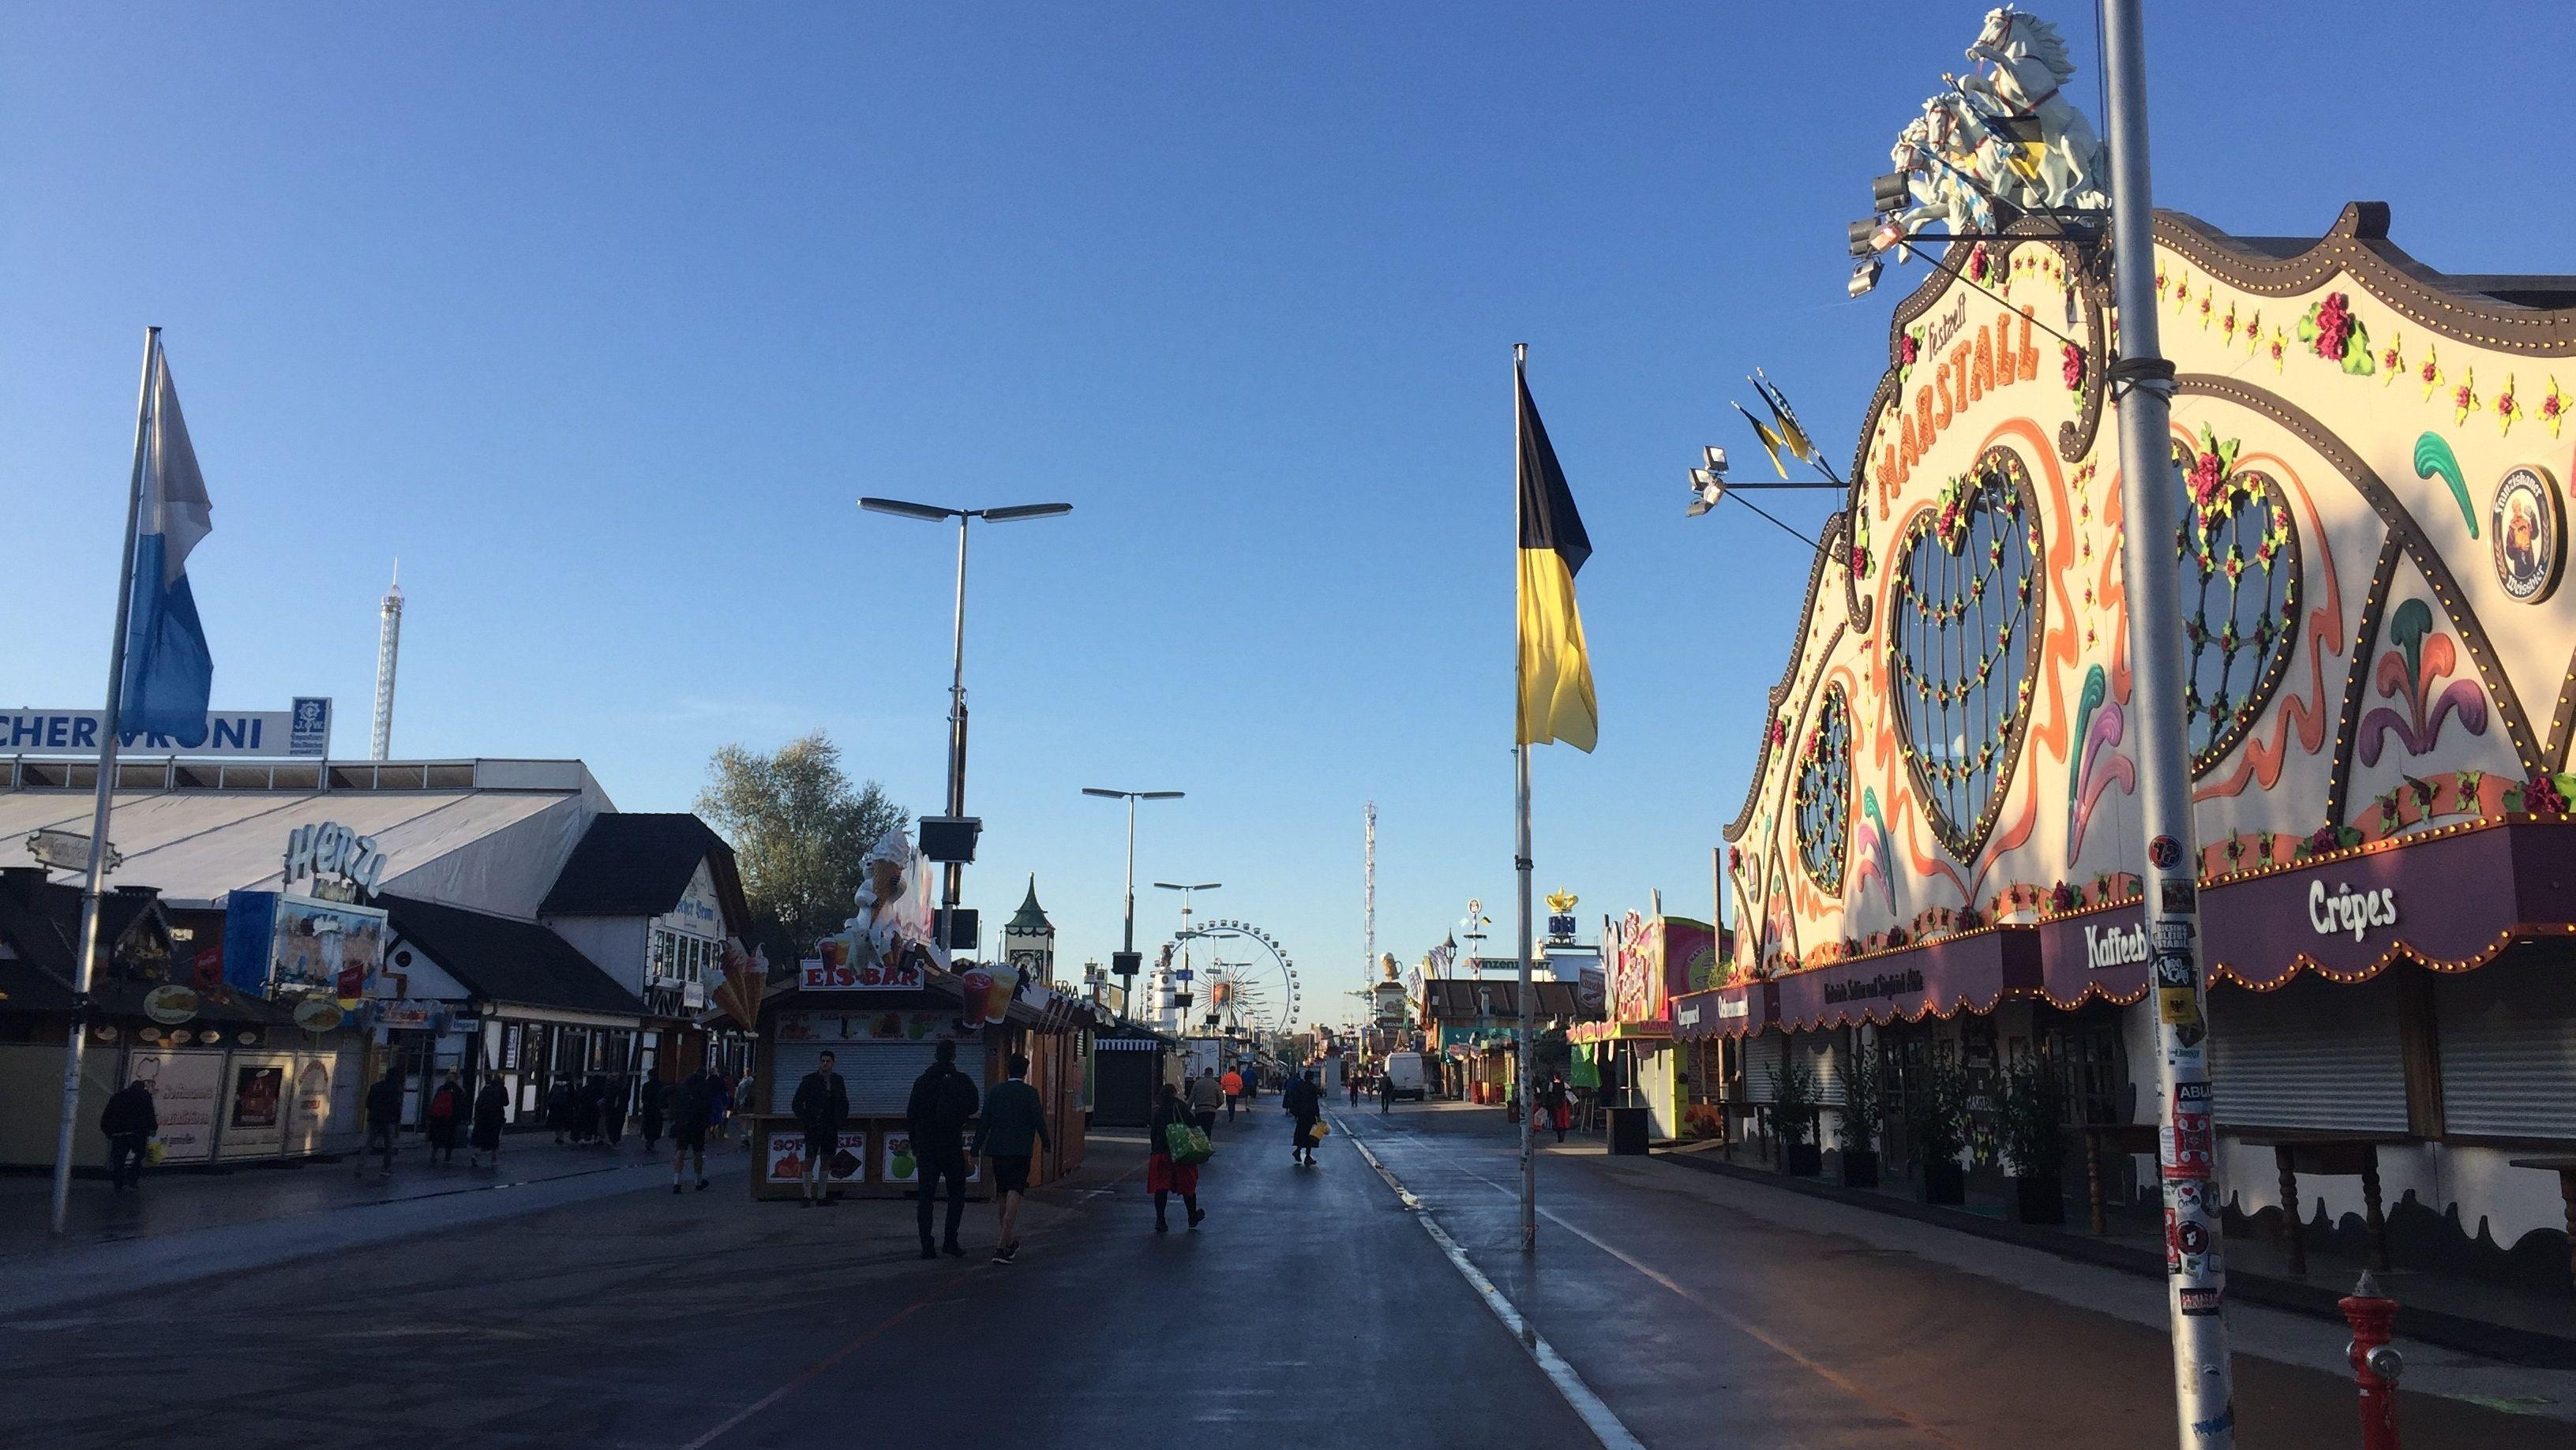 Festzelte auf dem Oktoberfest 2019